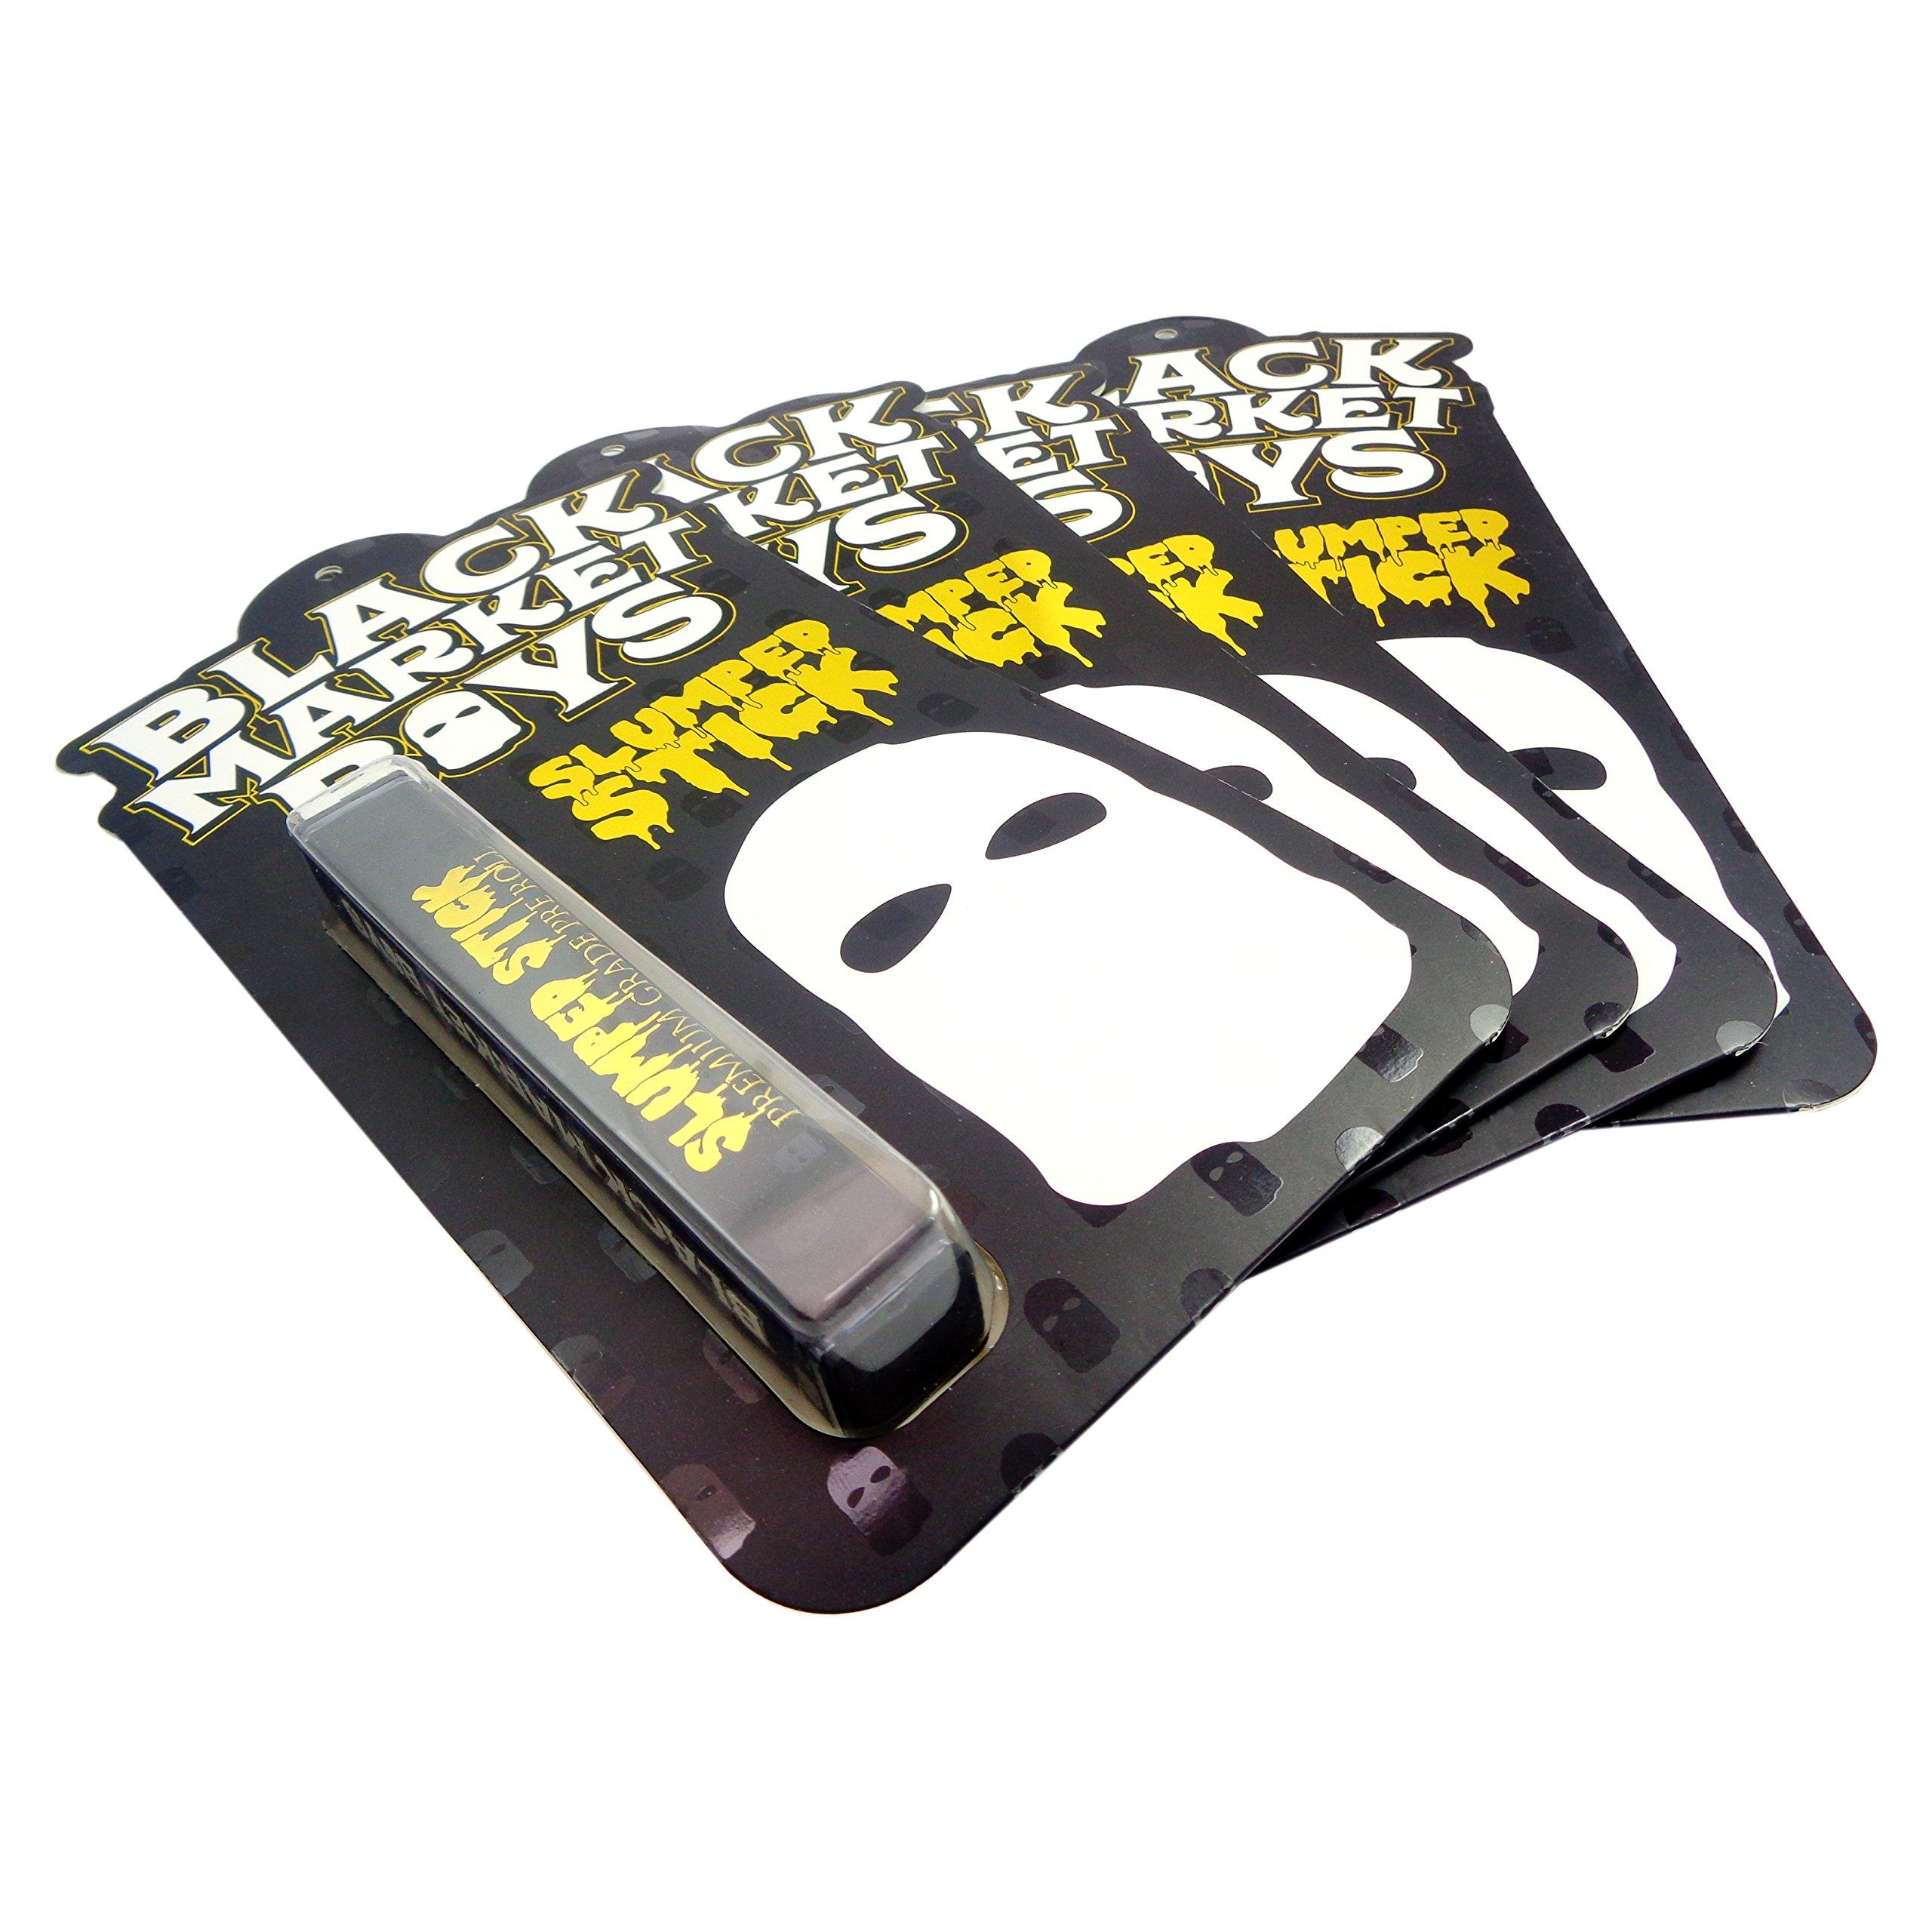 25 Black Market Boys XL Premium Shatter Labels Pre-roll Tube Plastic Blister Packaging Childproof Child Resistant Design TUBES INCLUDED